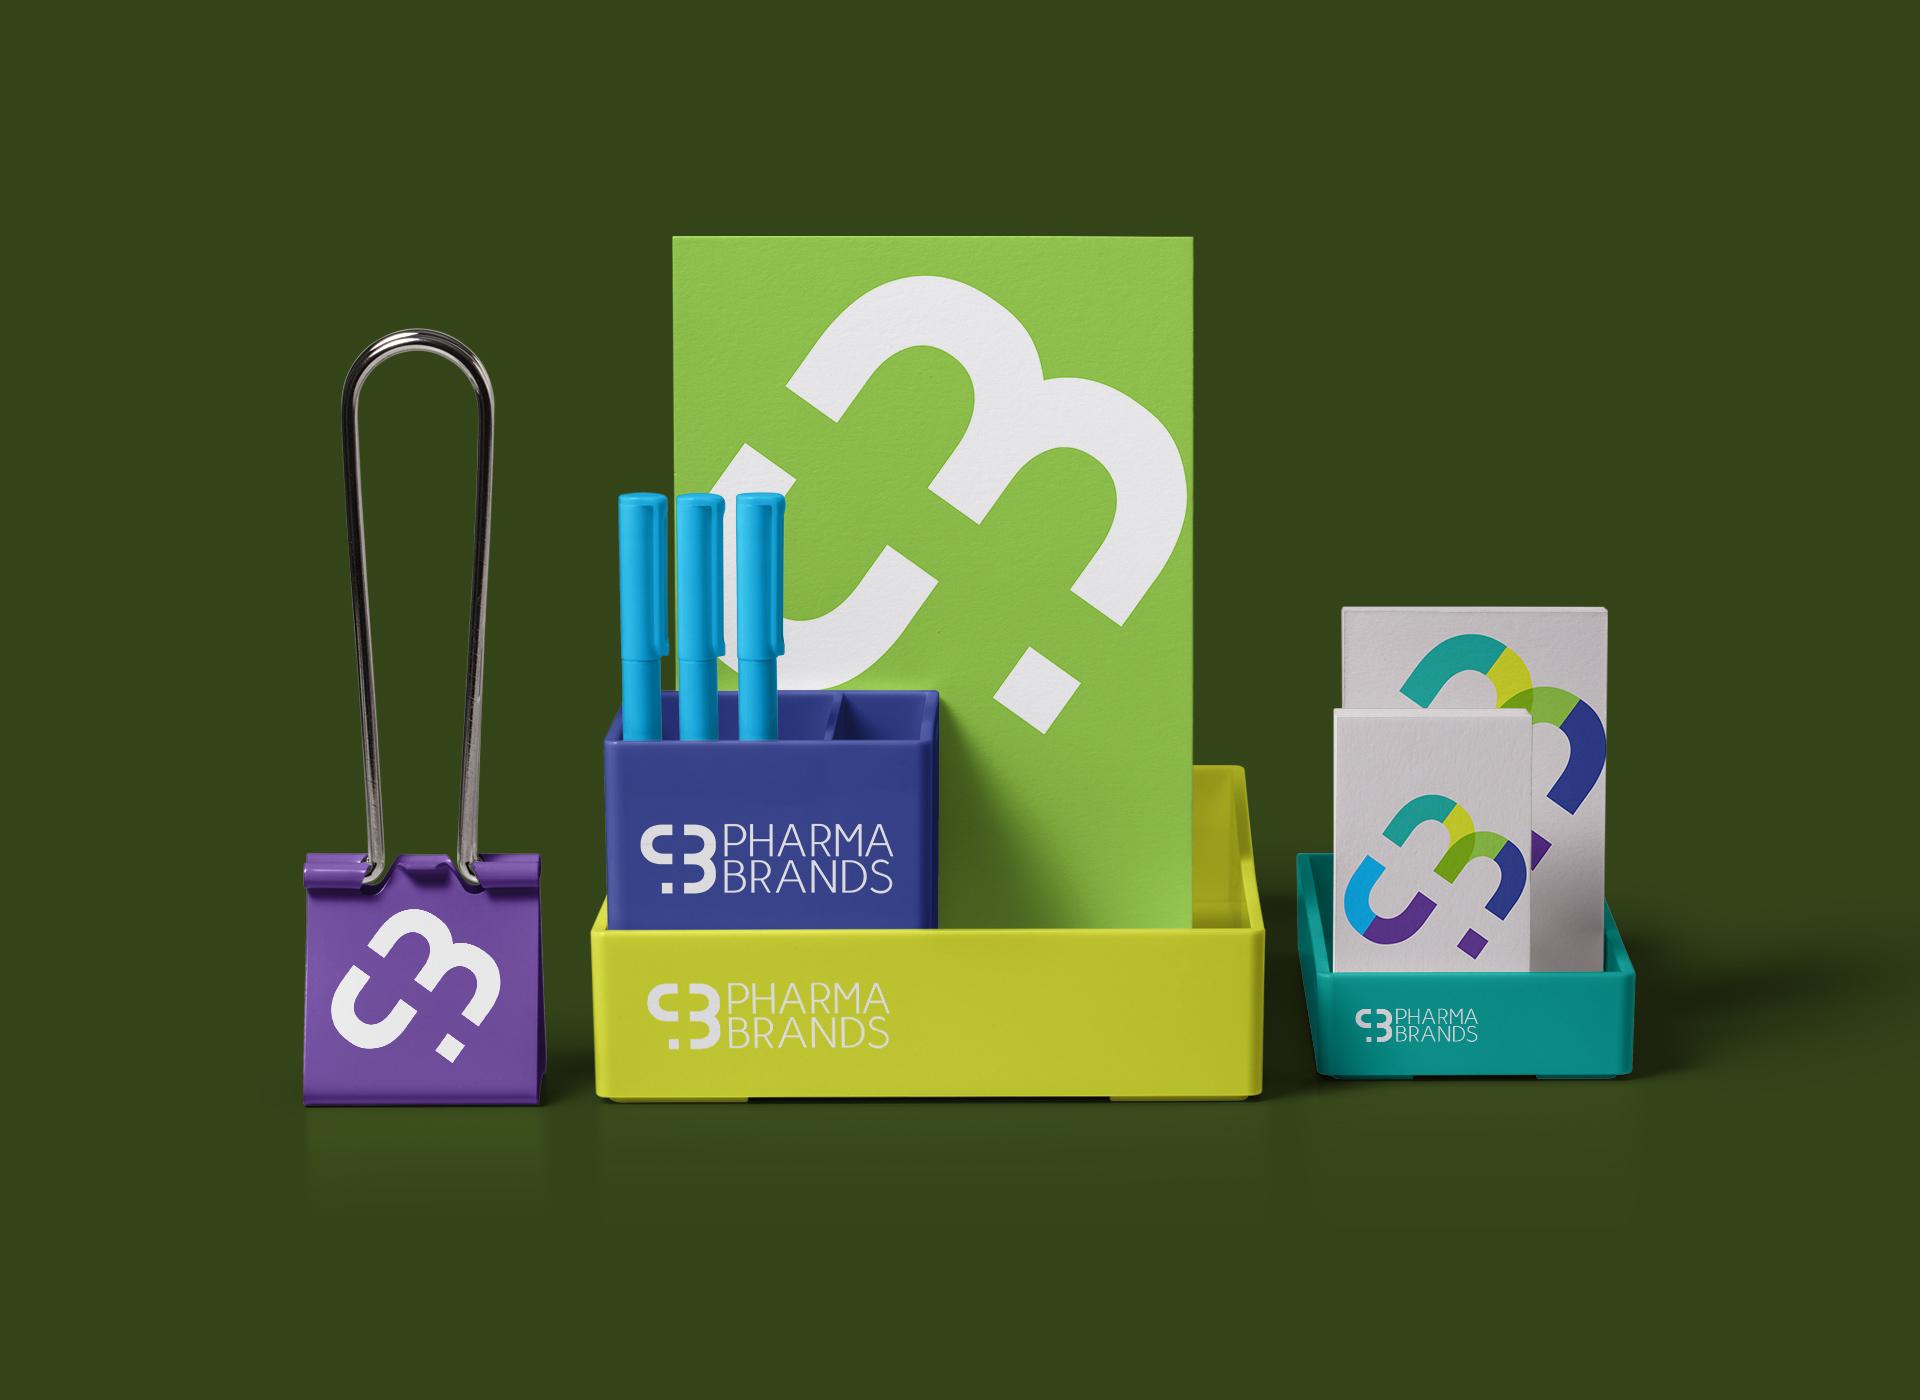 pharma brands boxes portofoliu inoveo